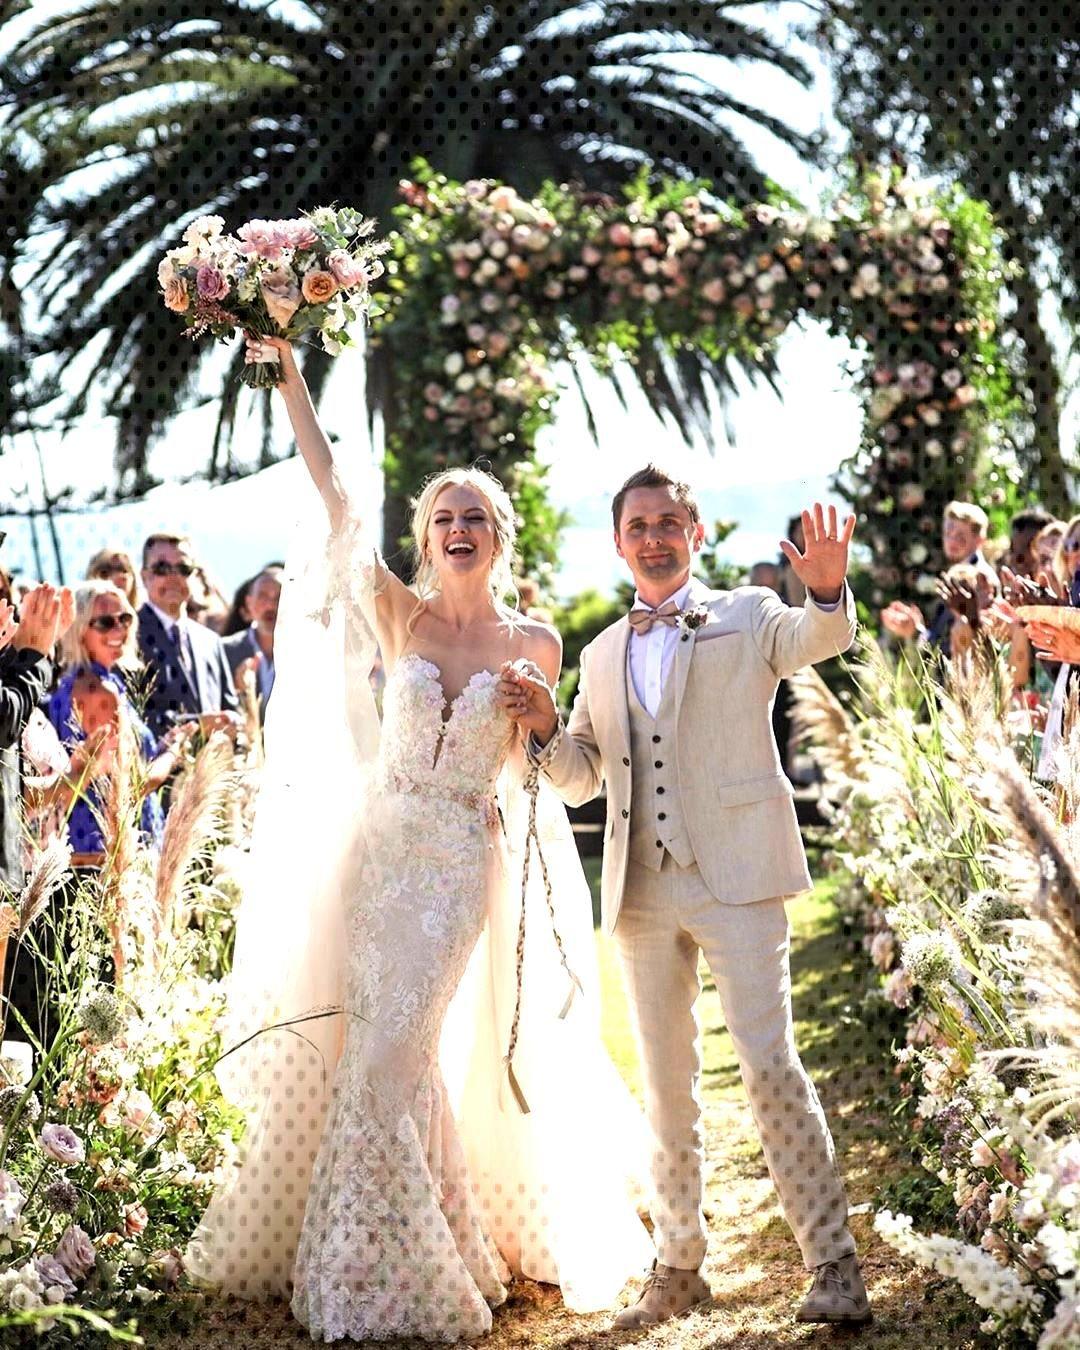 MUSE  Matt Bellamy and Elle EvansWedding 11 August 2019  Gulls Way MalibuMUSE  Matt B